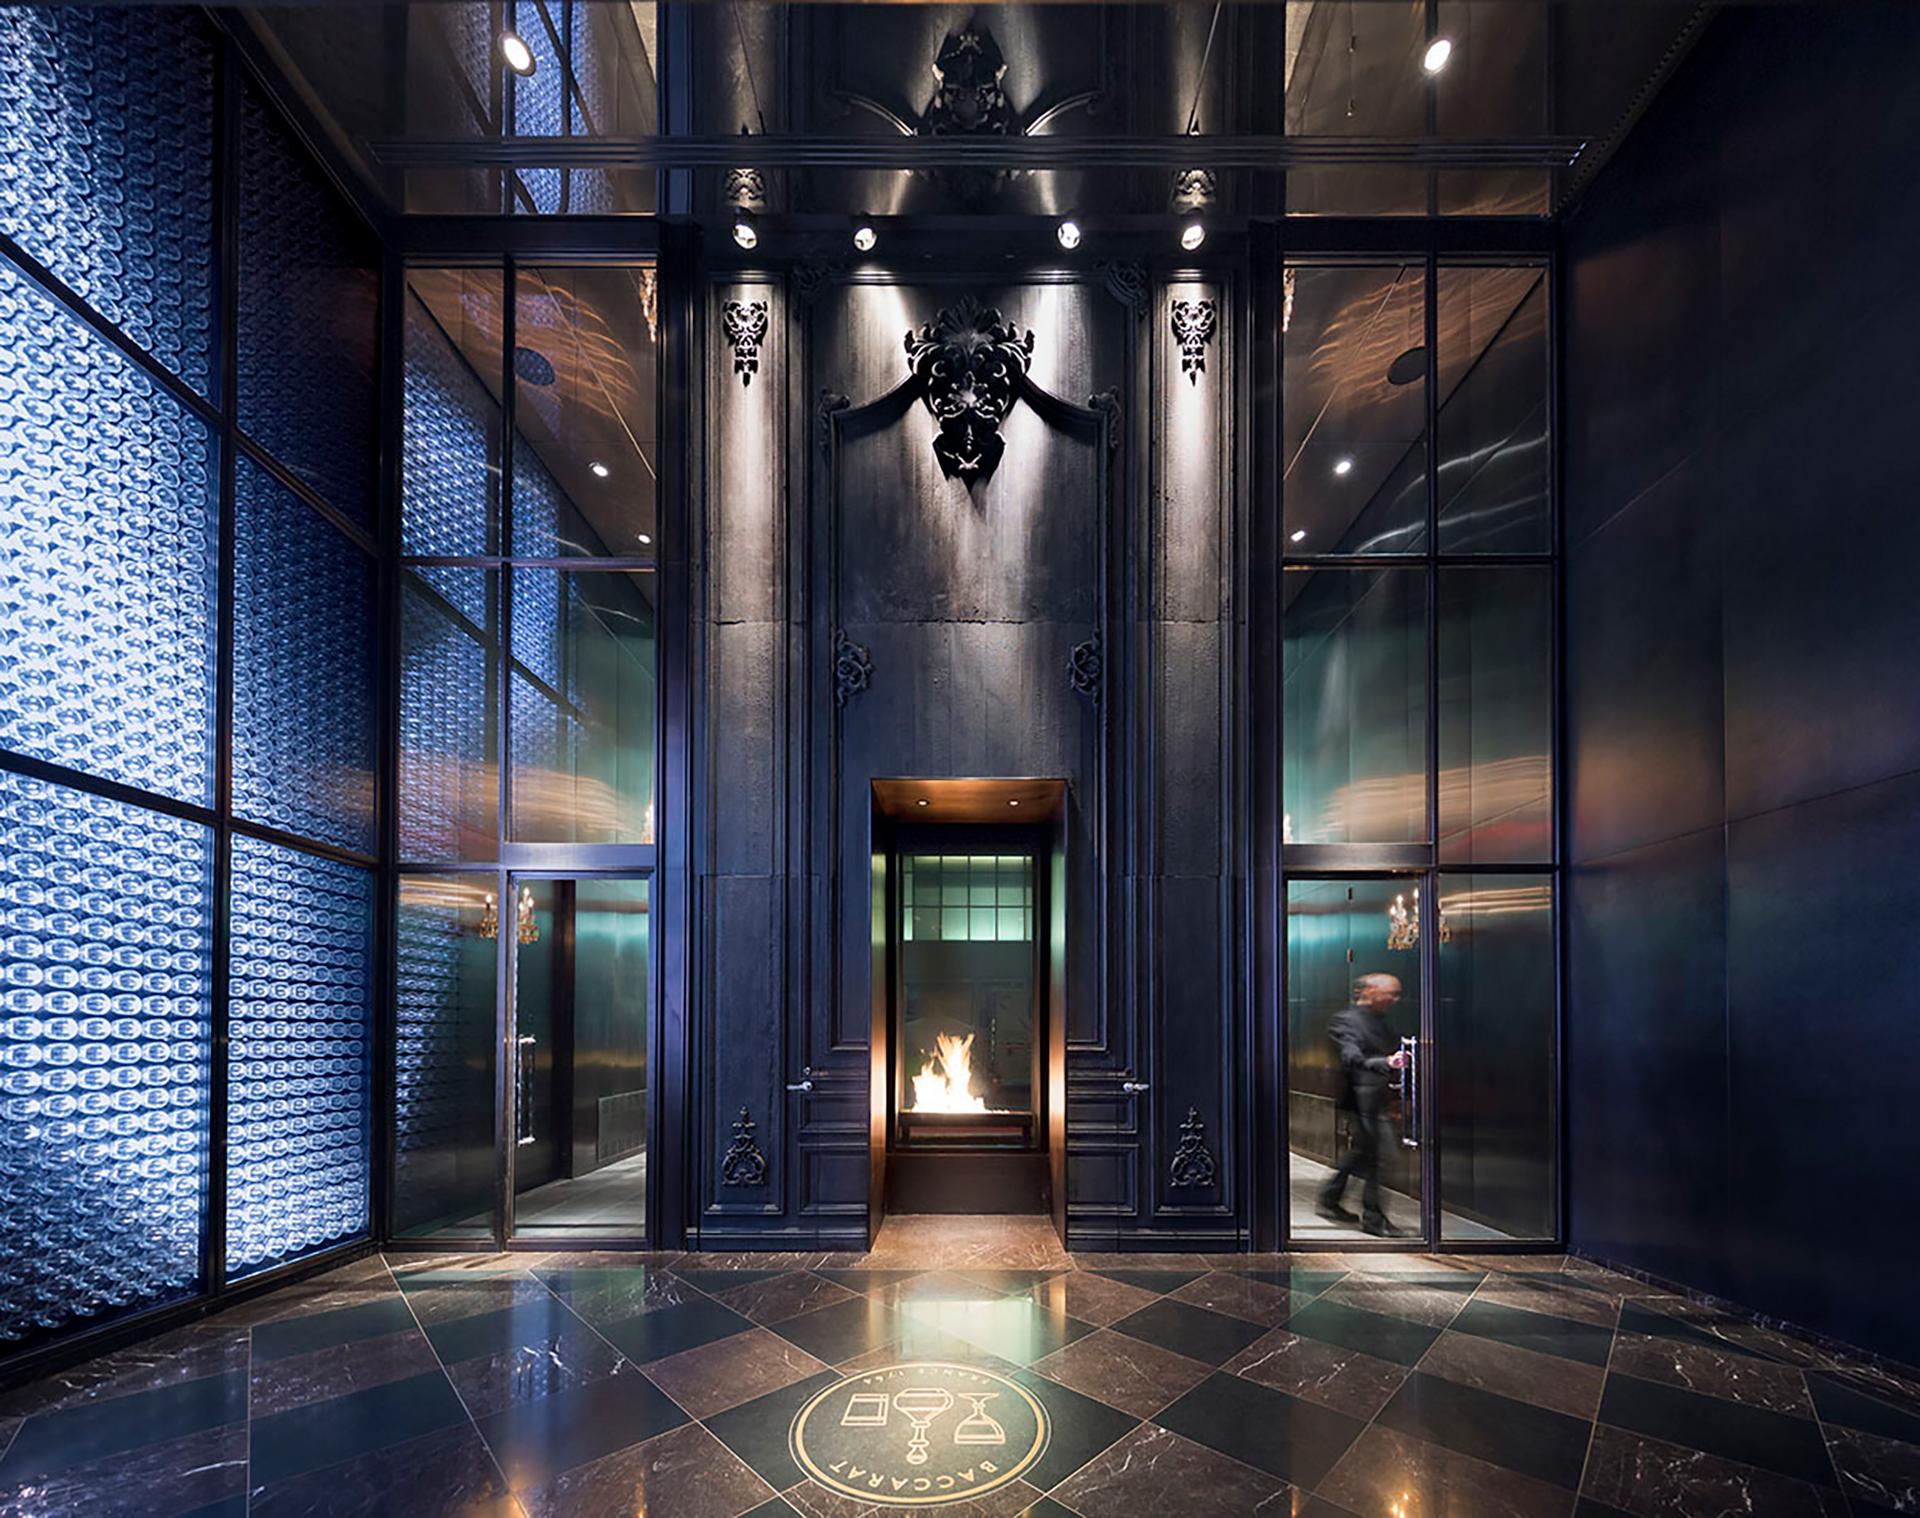 Baccarat Hotel, New York